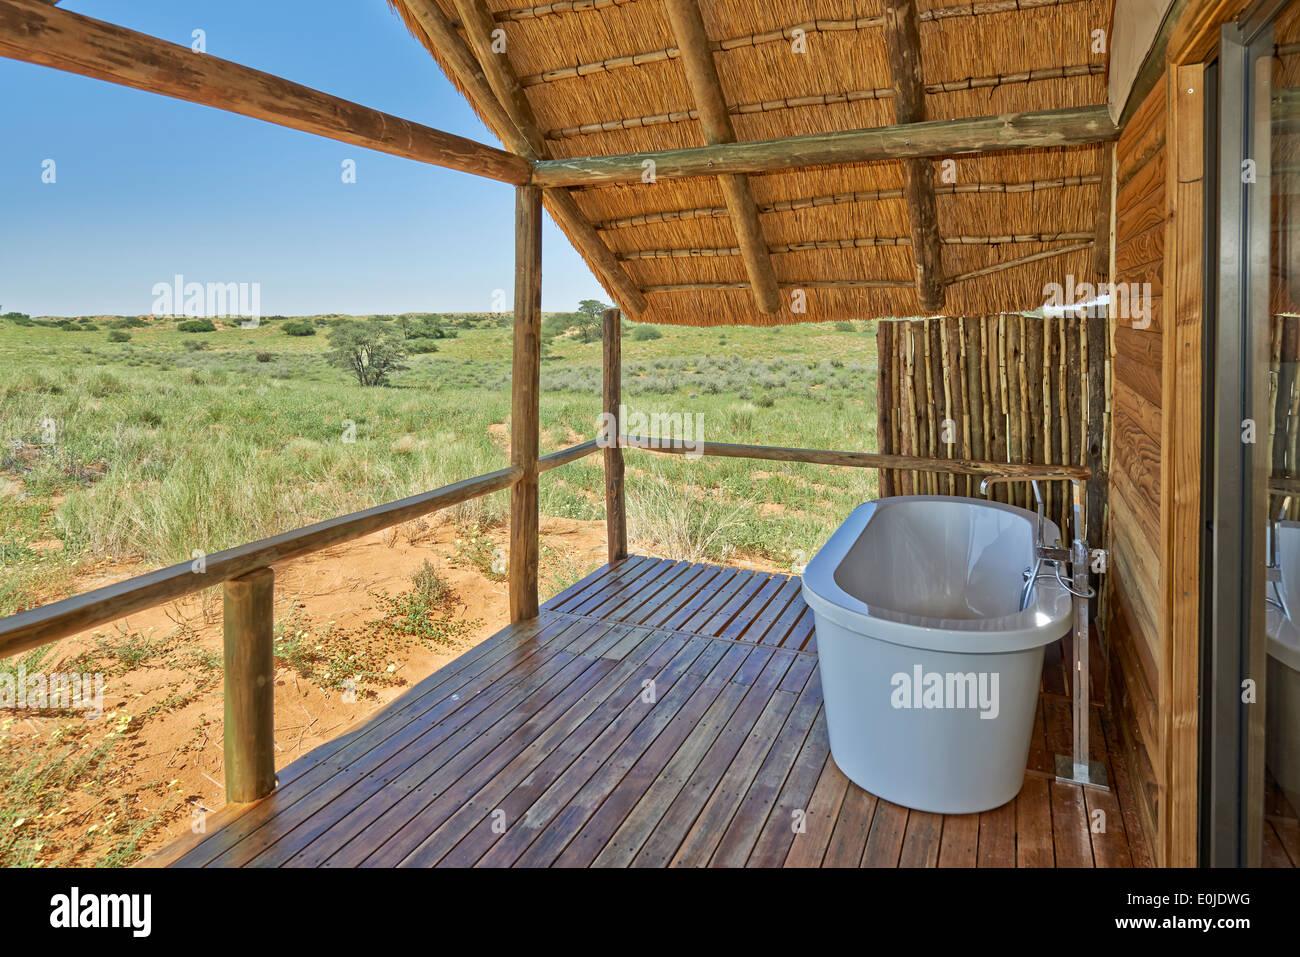 Blick von der privaten Terrasse mit Badewanne Rooiputs Lodge, Kgalagadi Transfrontier Park, Kalahari, Südafrika, Botswana, Afrika Stockbild